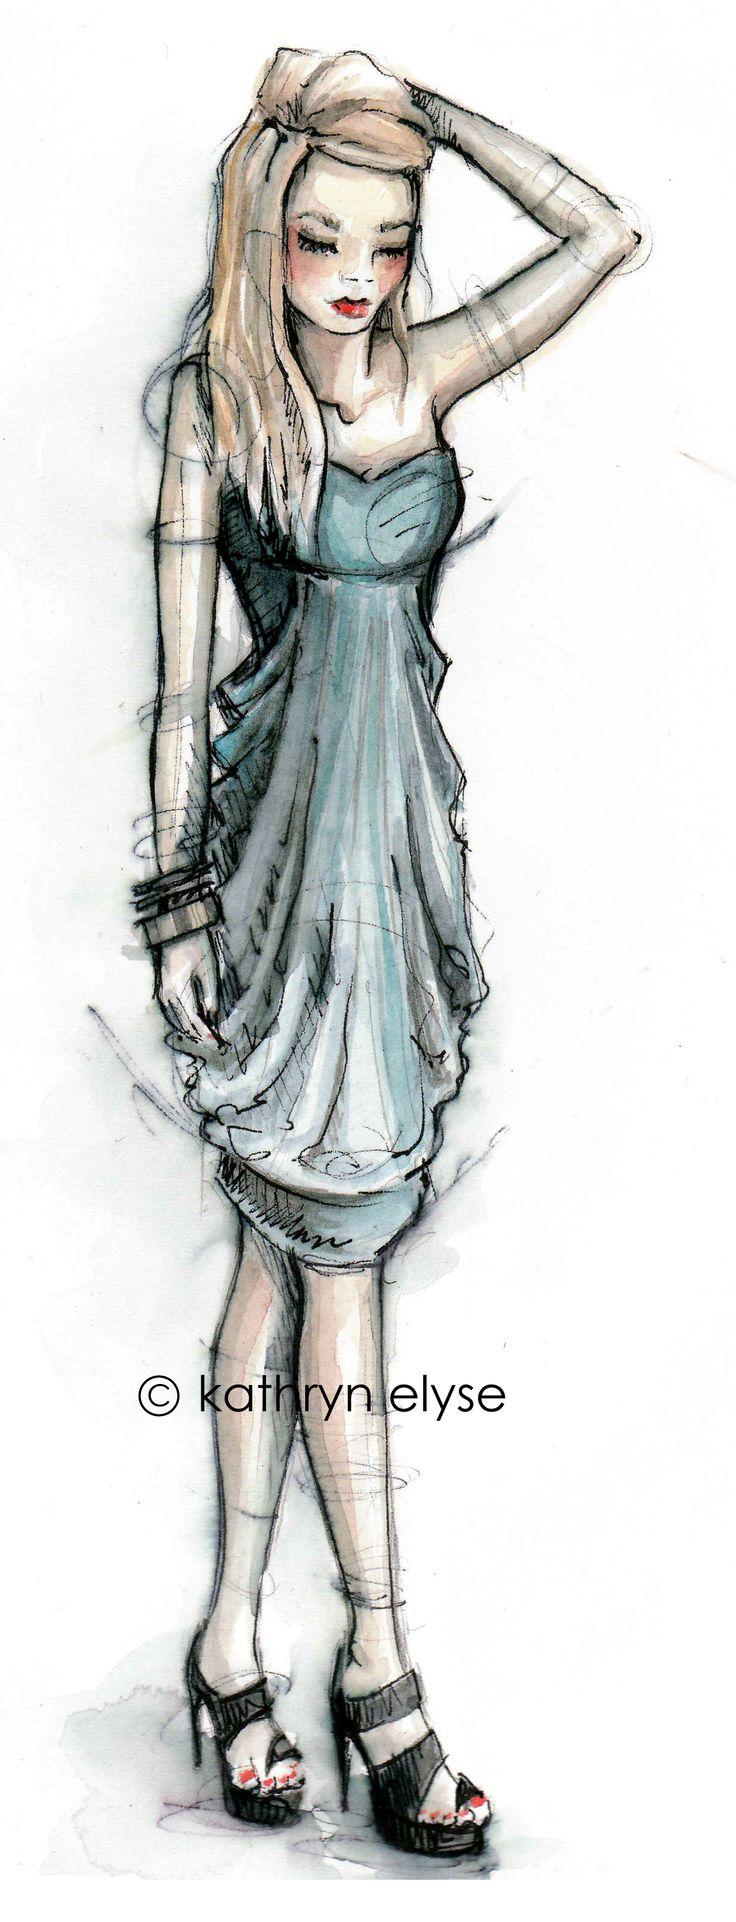 BlueBlue, Rogers Http Paperfashion Nets, Fashion Illustration, Illustration Fashion, Secret Illustration